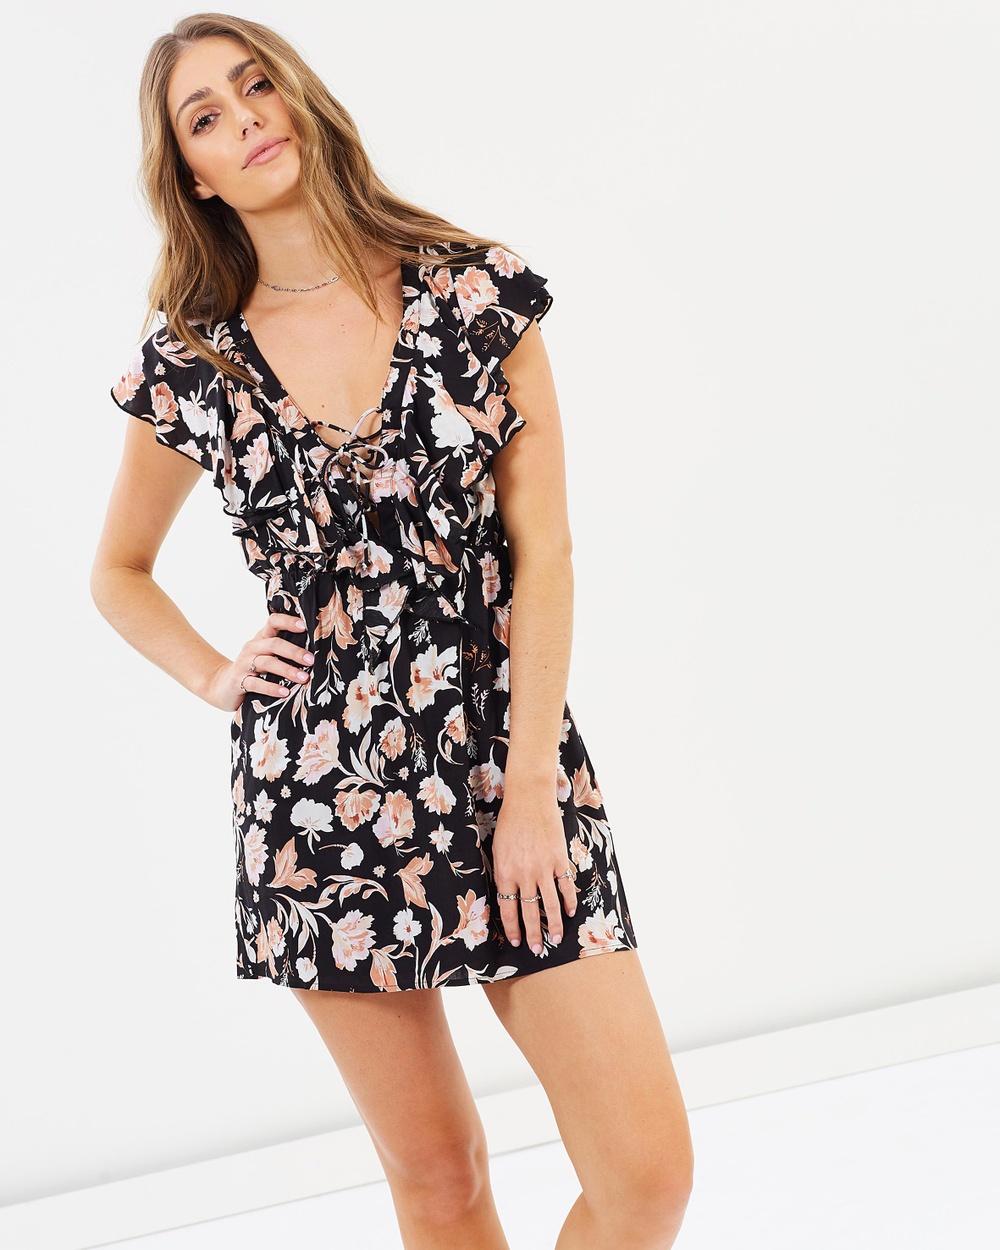 Amuse Society Play Nice Dress Printed Dresses Black Floral Play Nice Dress